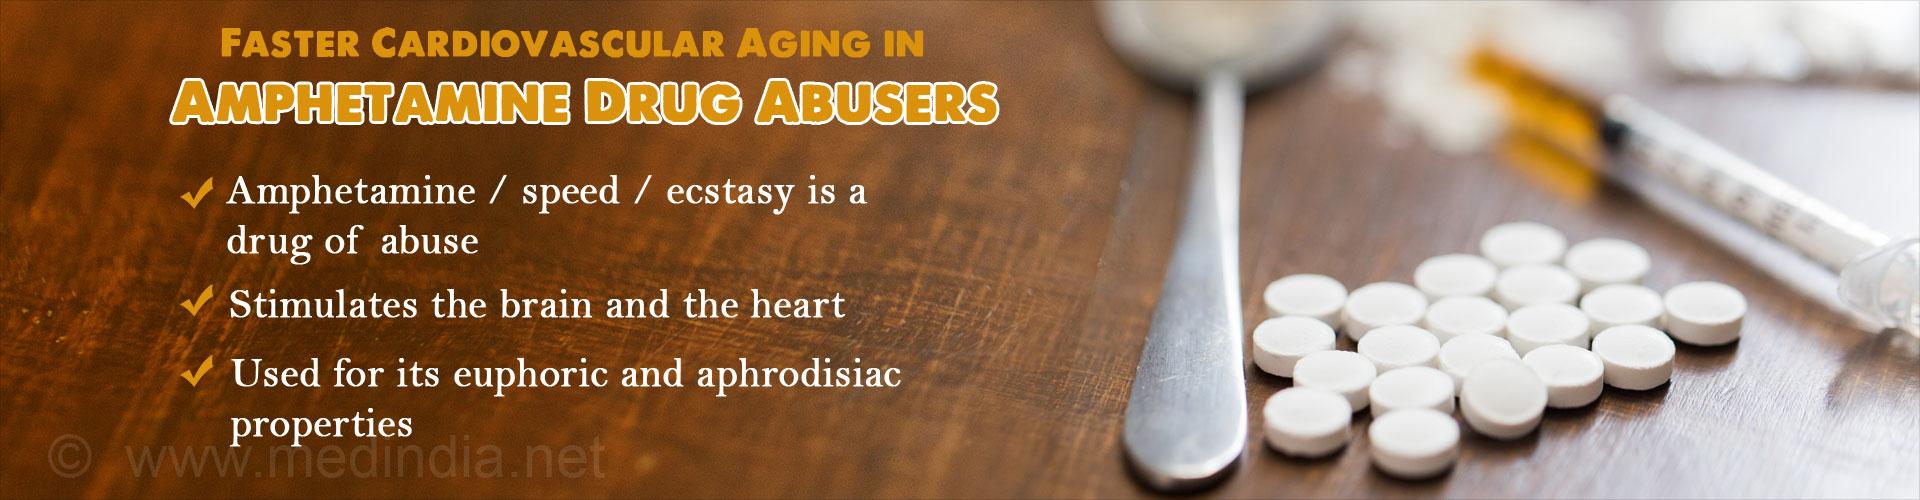 Recreational Amphetamine Accelerates Cardiovascular Aging